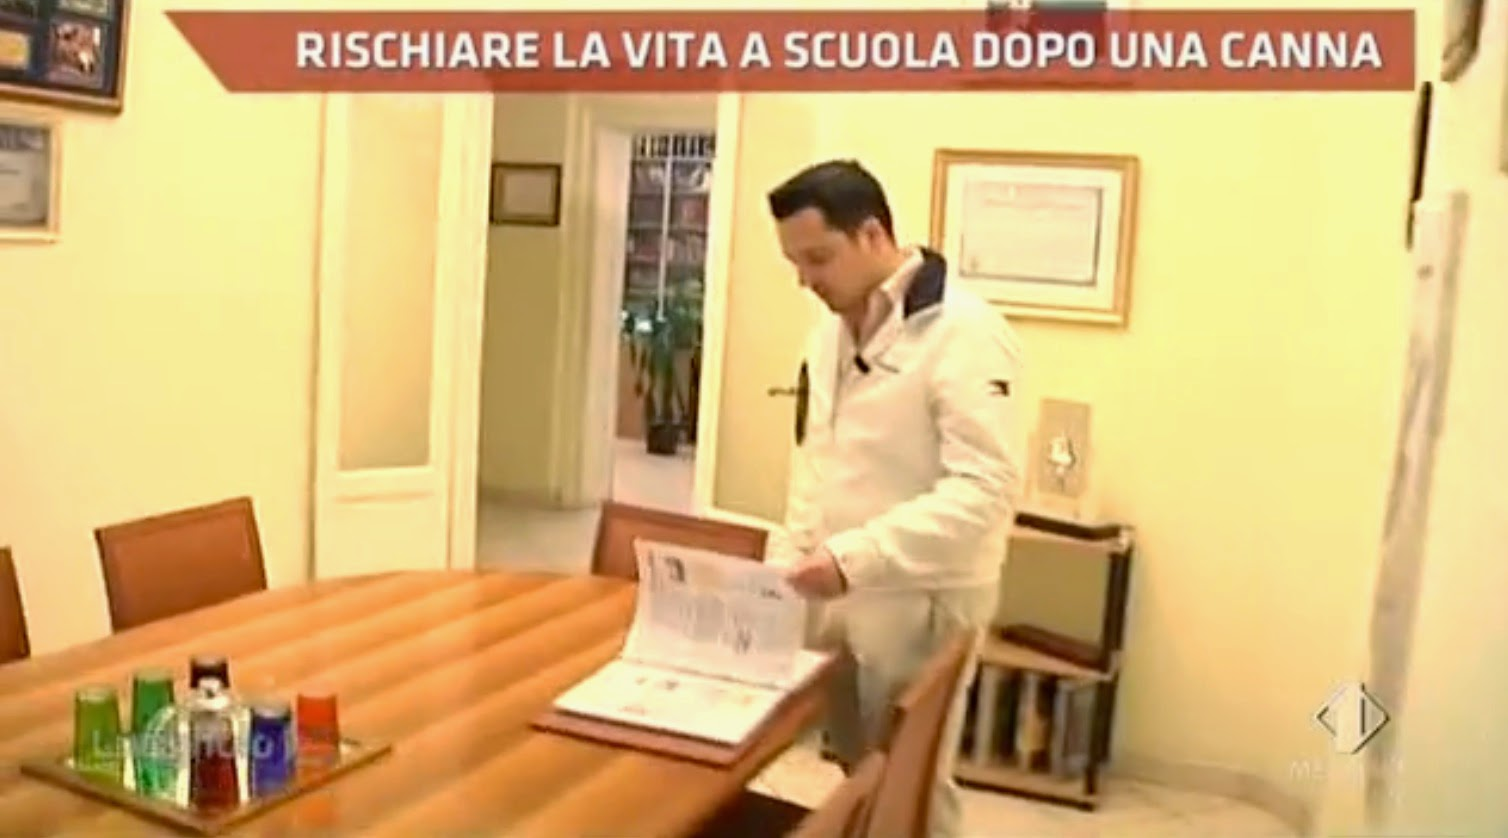 ervizio Lucignolo Paolo Narconon